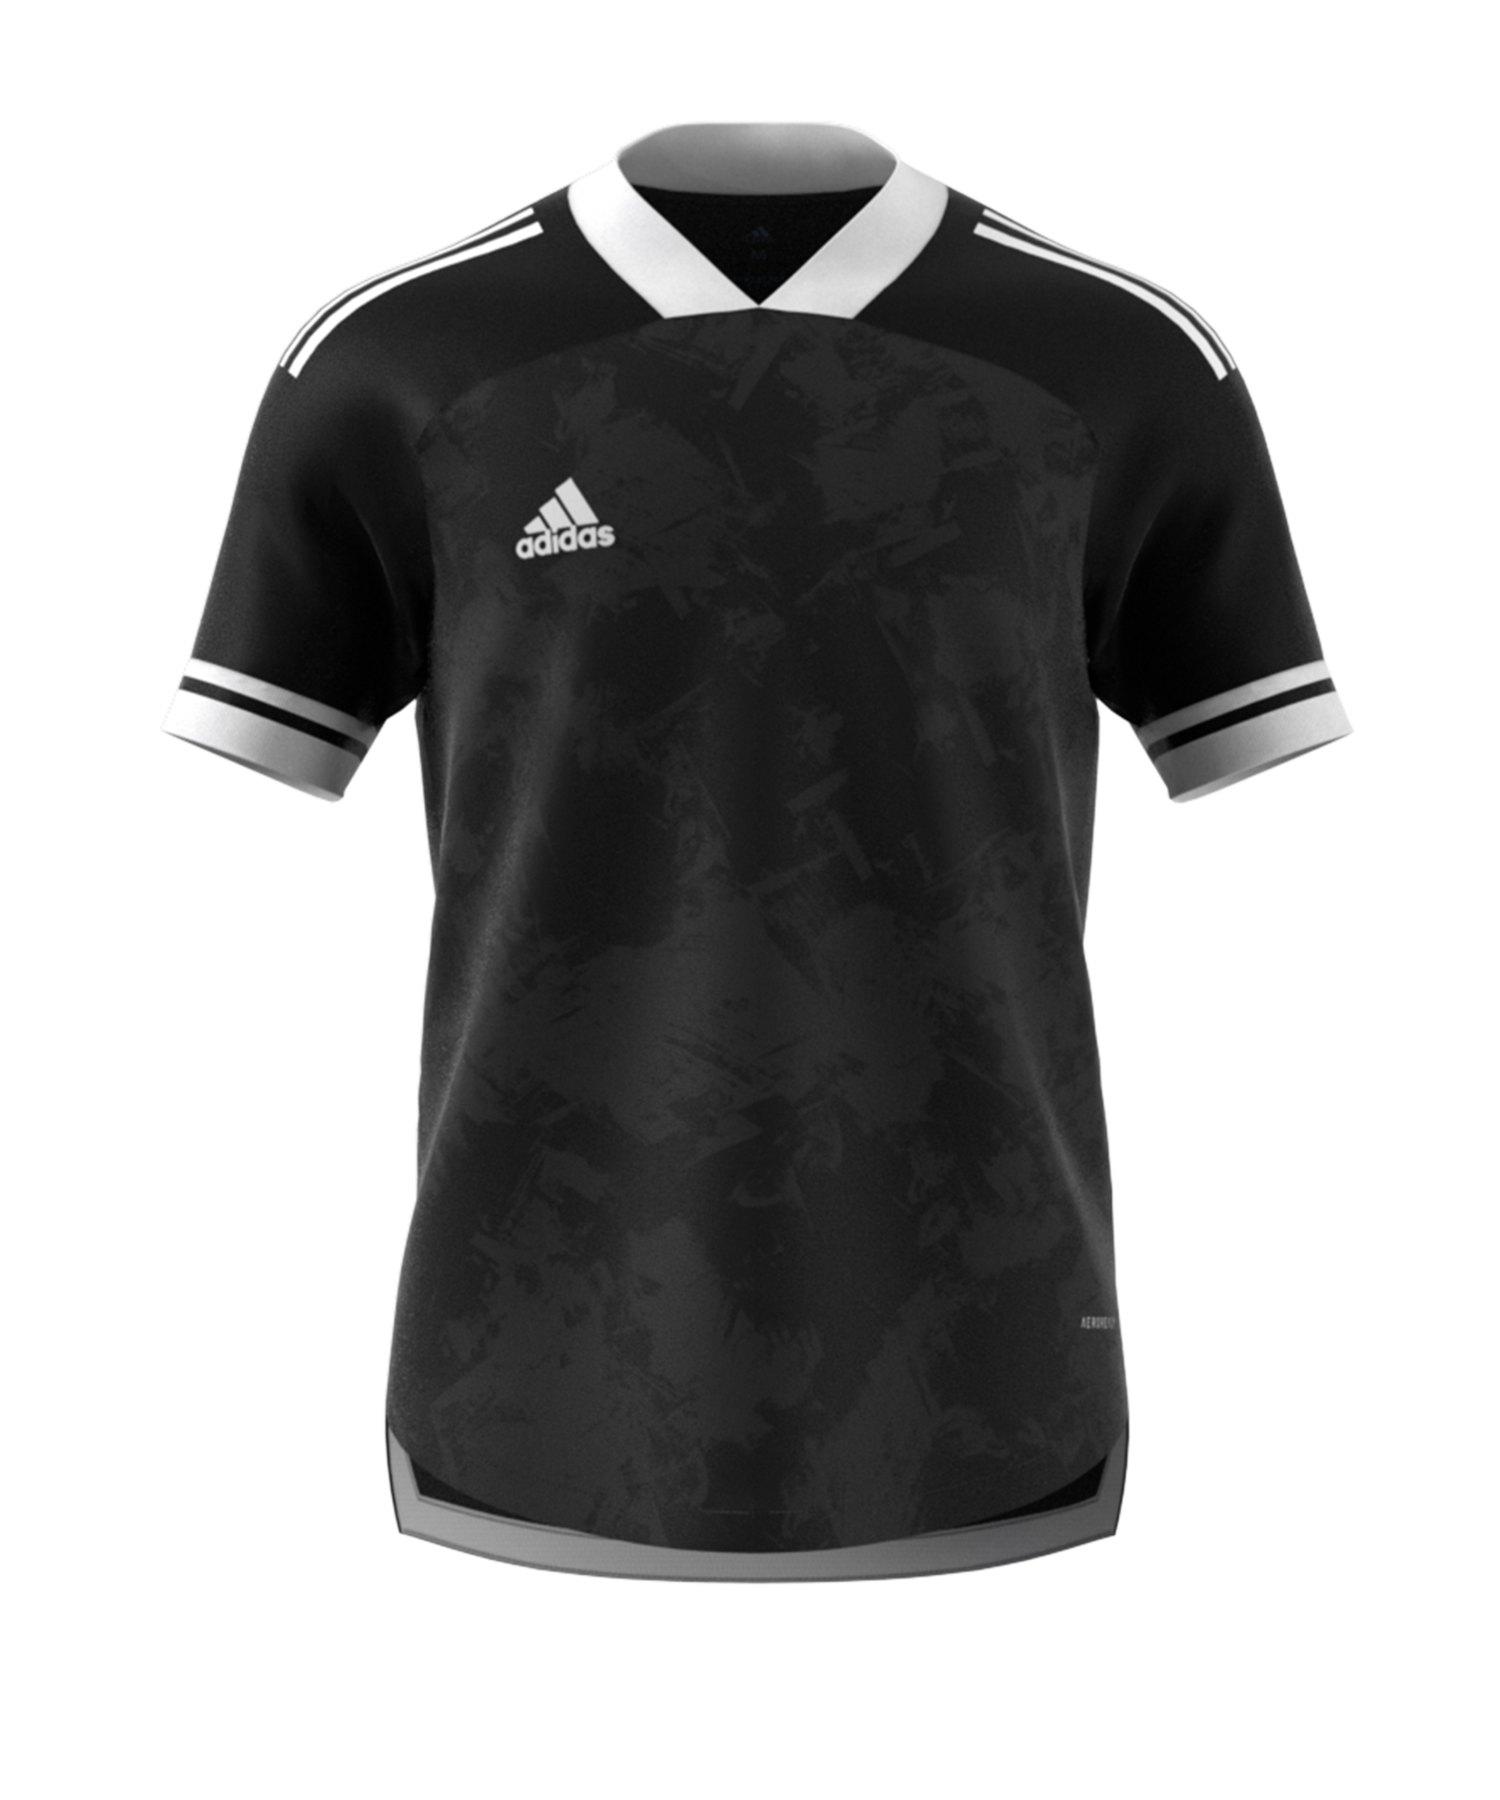 adidas Condivo 20 Trikot kurzarmSchwarz Weiss - schwarz